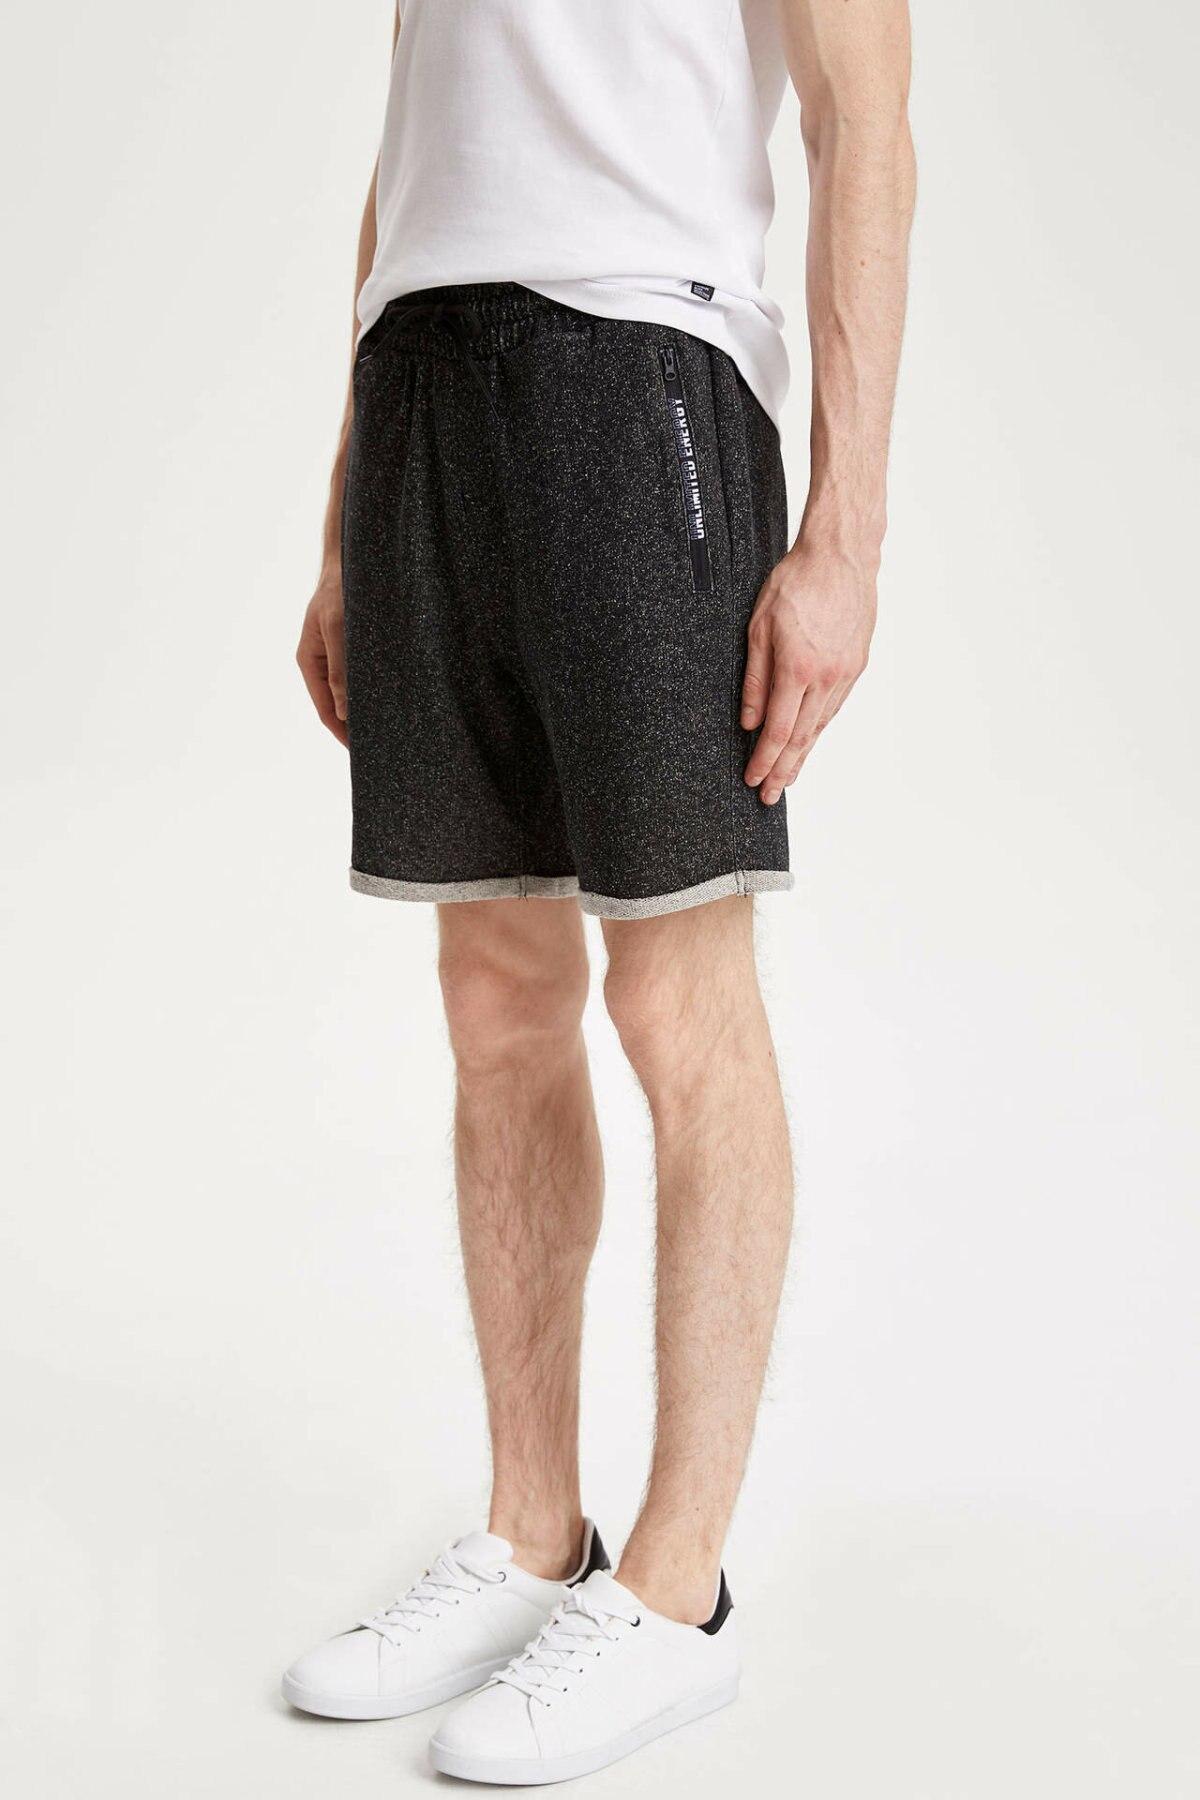 DeFacto Man Summer Casual Denim SHorts Men Lace-up Blue Black Short Bottom Male Mid-waist Shorts-K7161AZ19SM